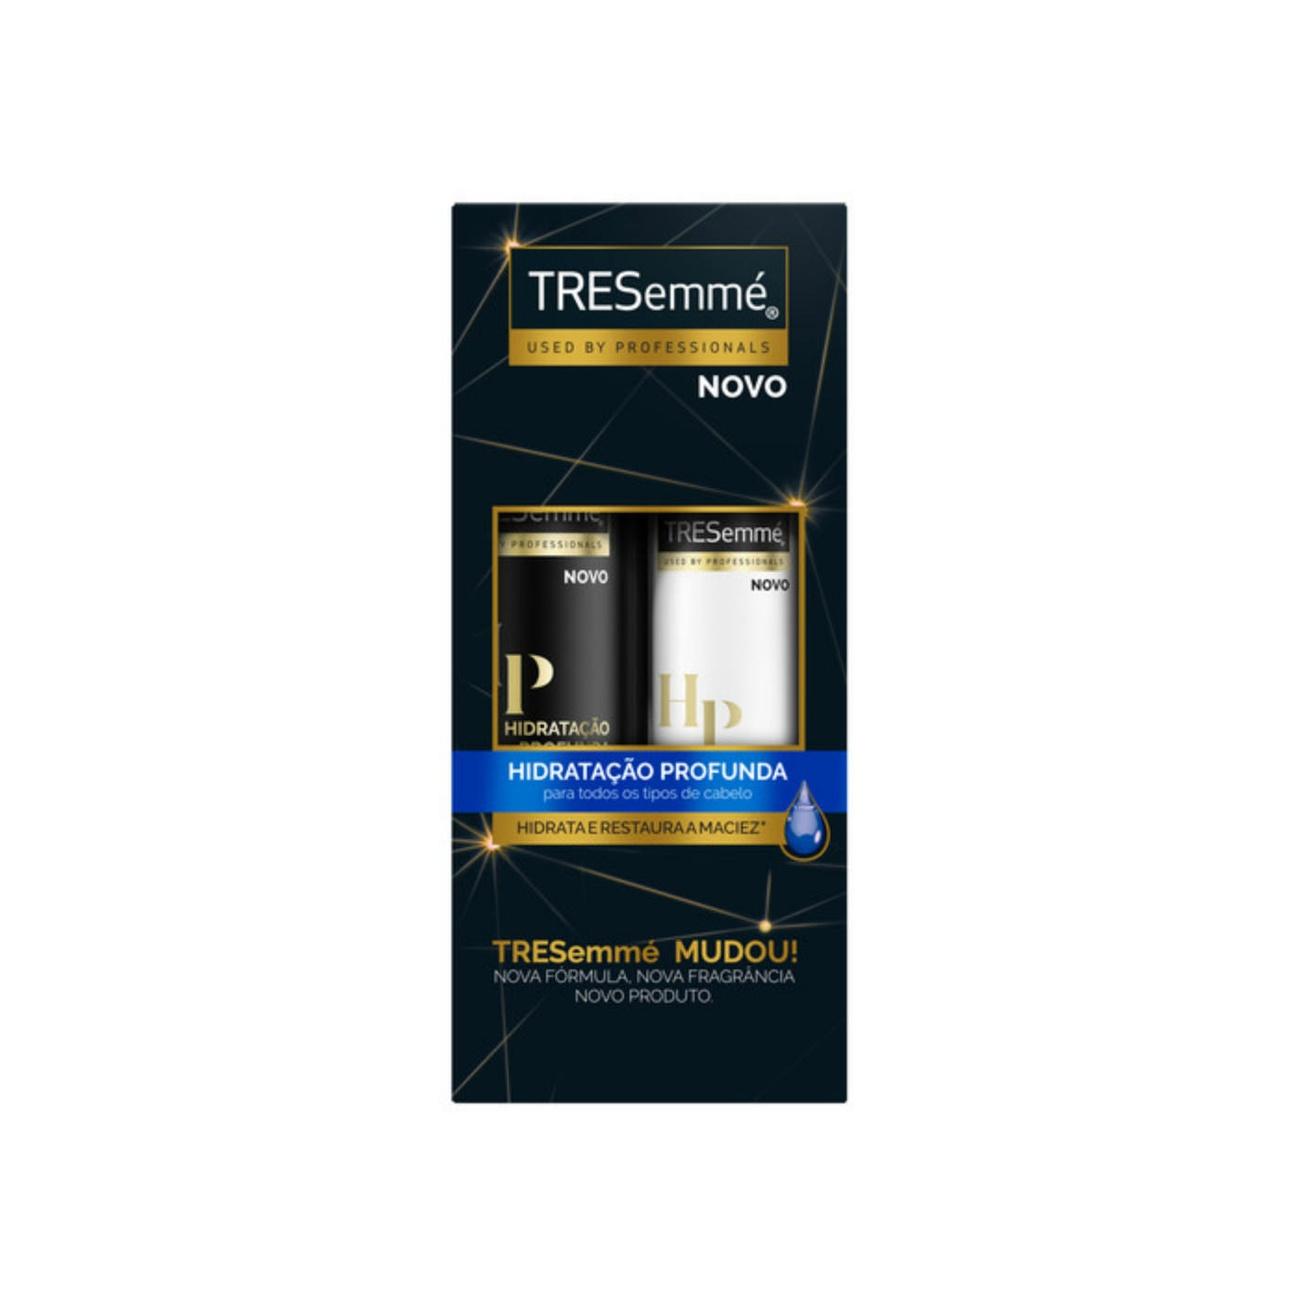 Oferta Tresemmé Shampoo Hidratação Profunda 400ml + Condicionador 200ml